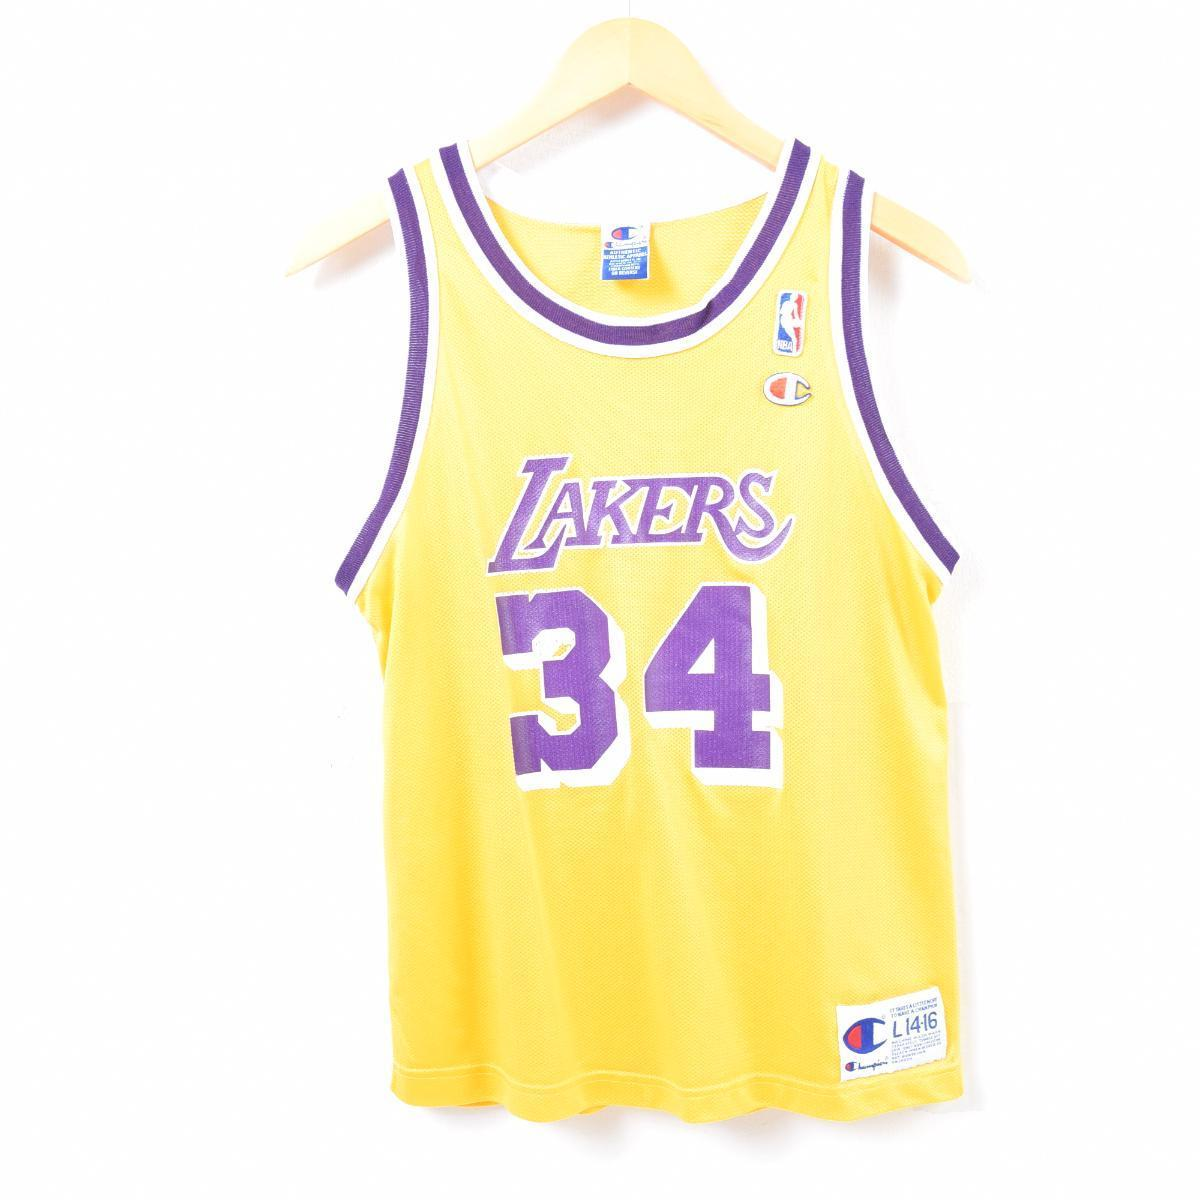 f612b2a32431 90s champion Champion NBA LOS ANGELES LAKERS Los Angeles Lakers Shaquille  O Neal Shaquille O Neal game shirt replica uniform men S  waq7203